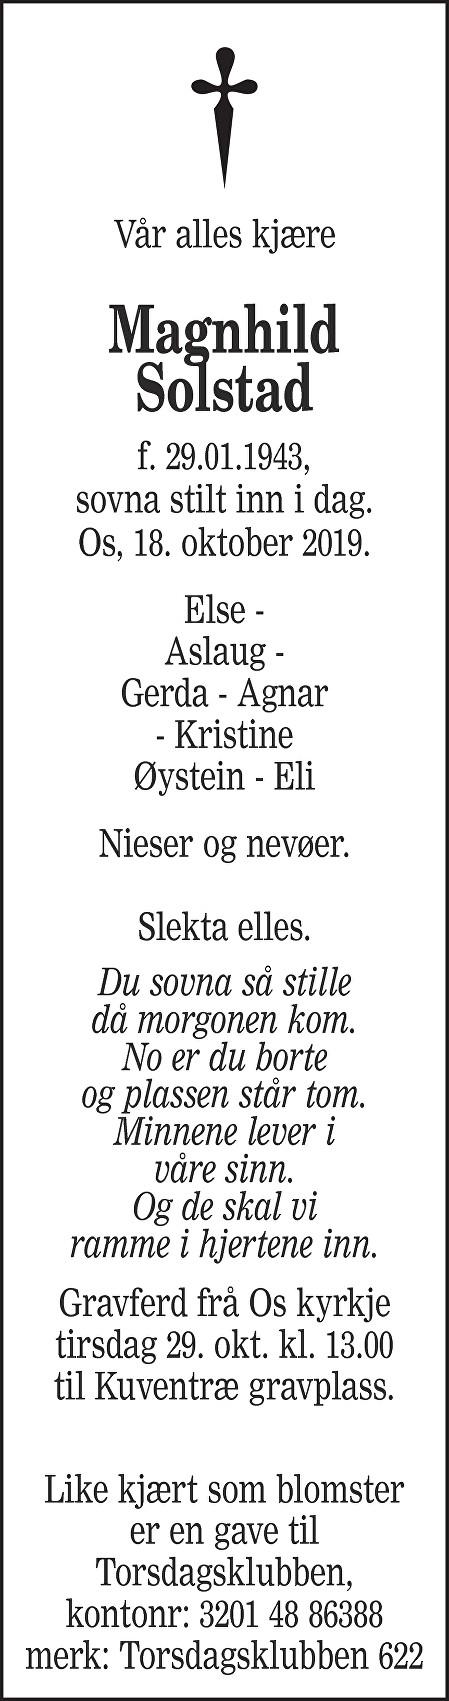 Magnhild Solstad Dødsannonse